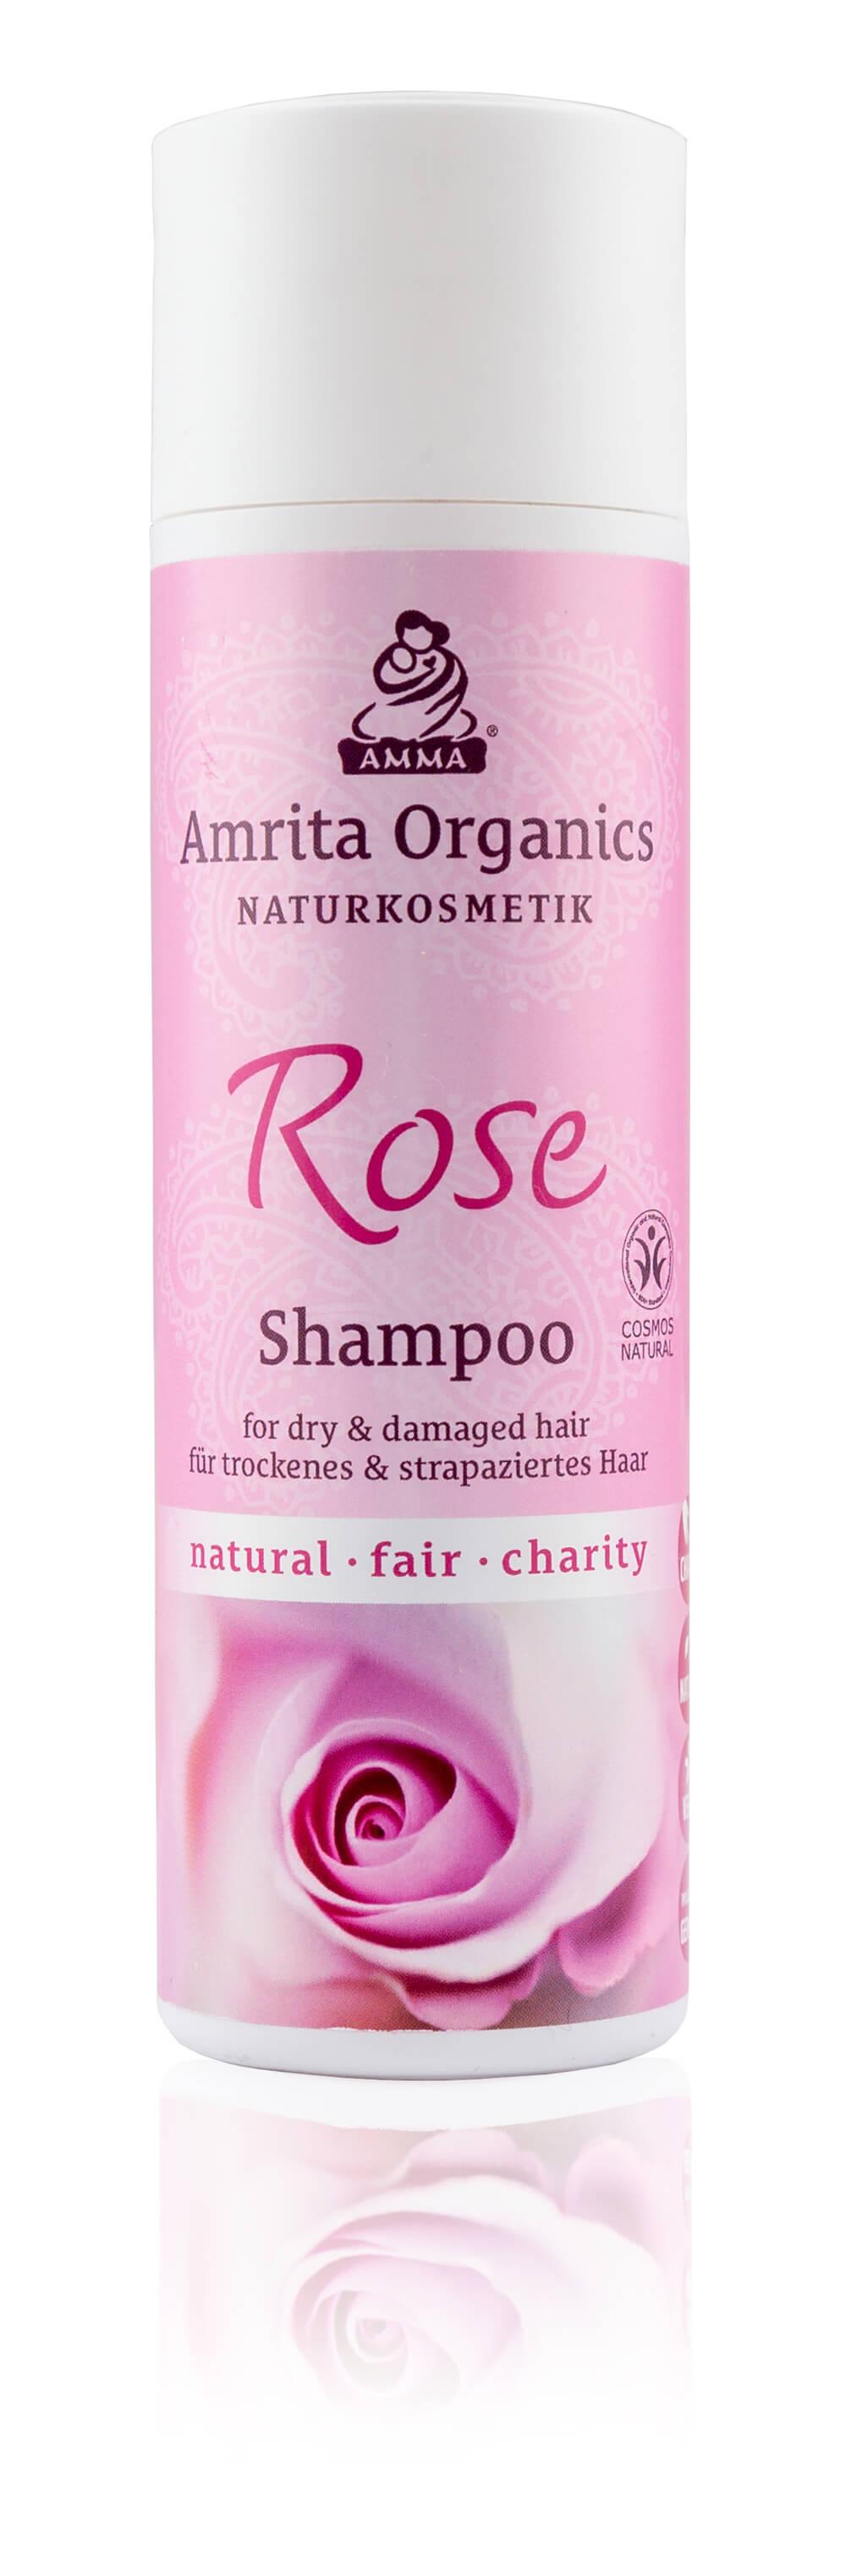 Shampoo Rose